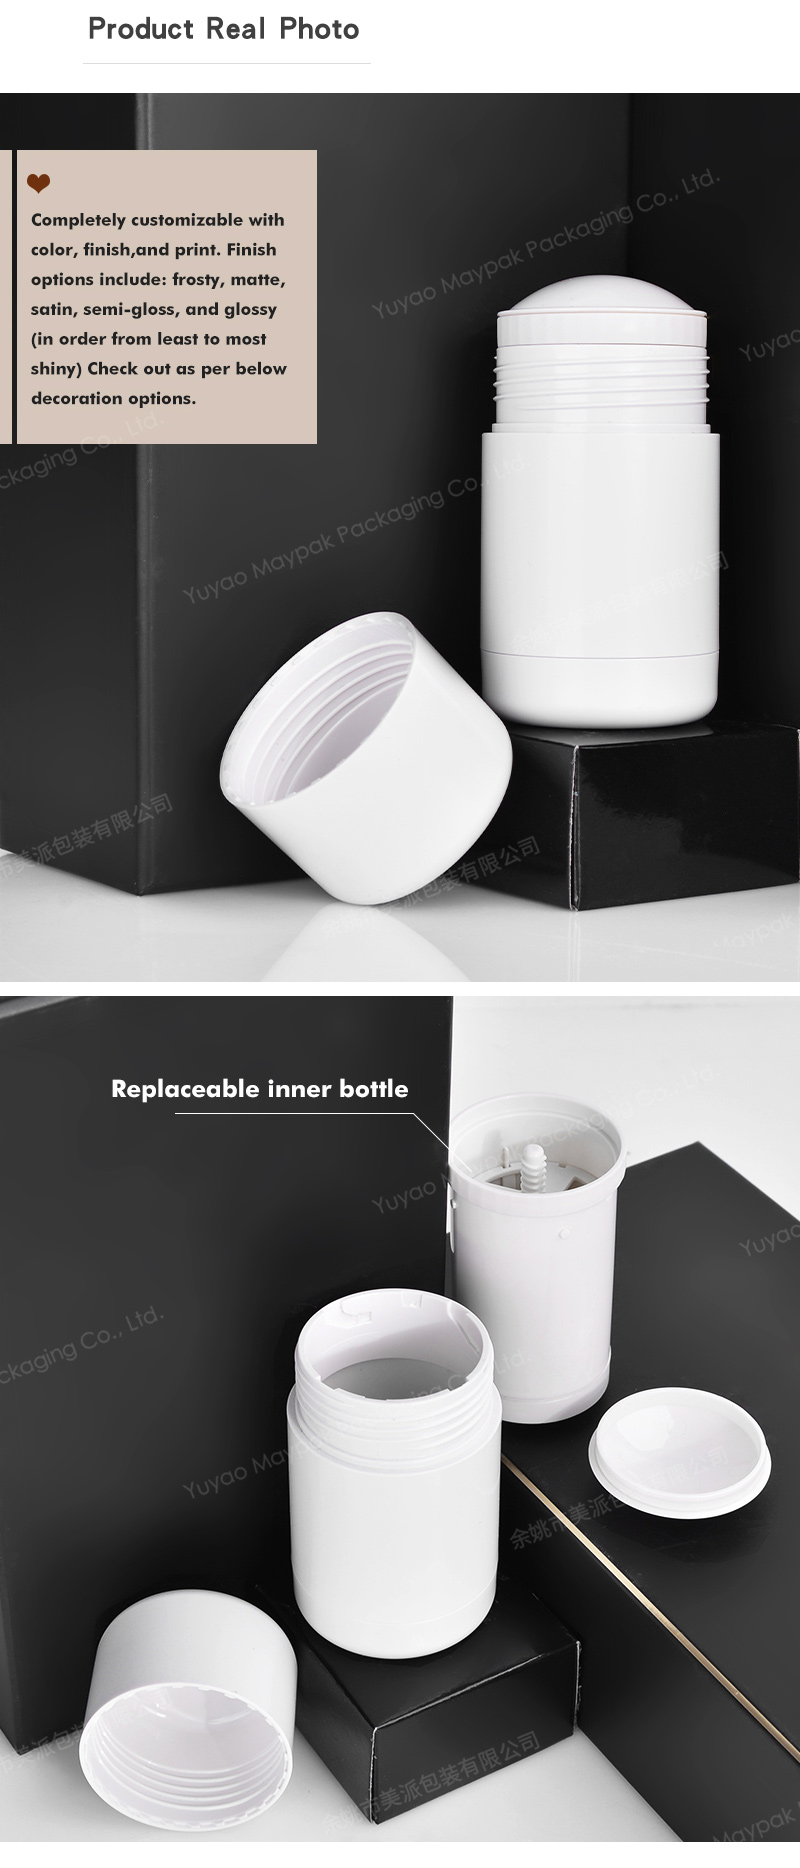 Refillable Deodorant Stick Container